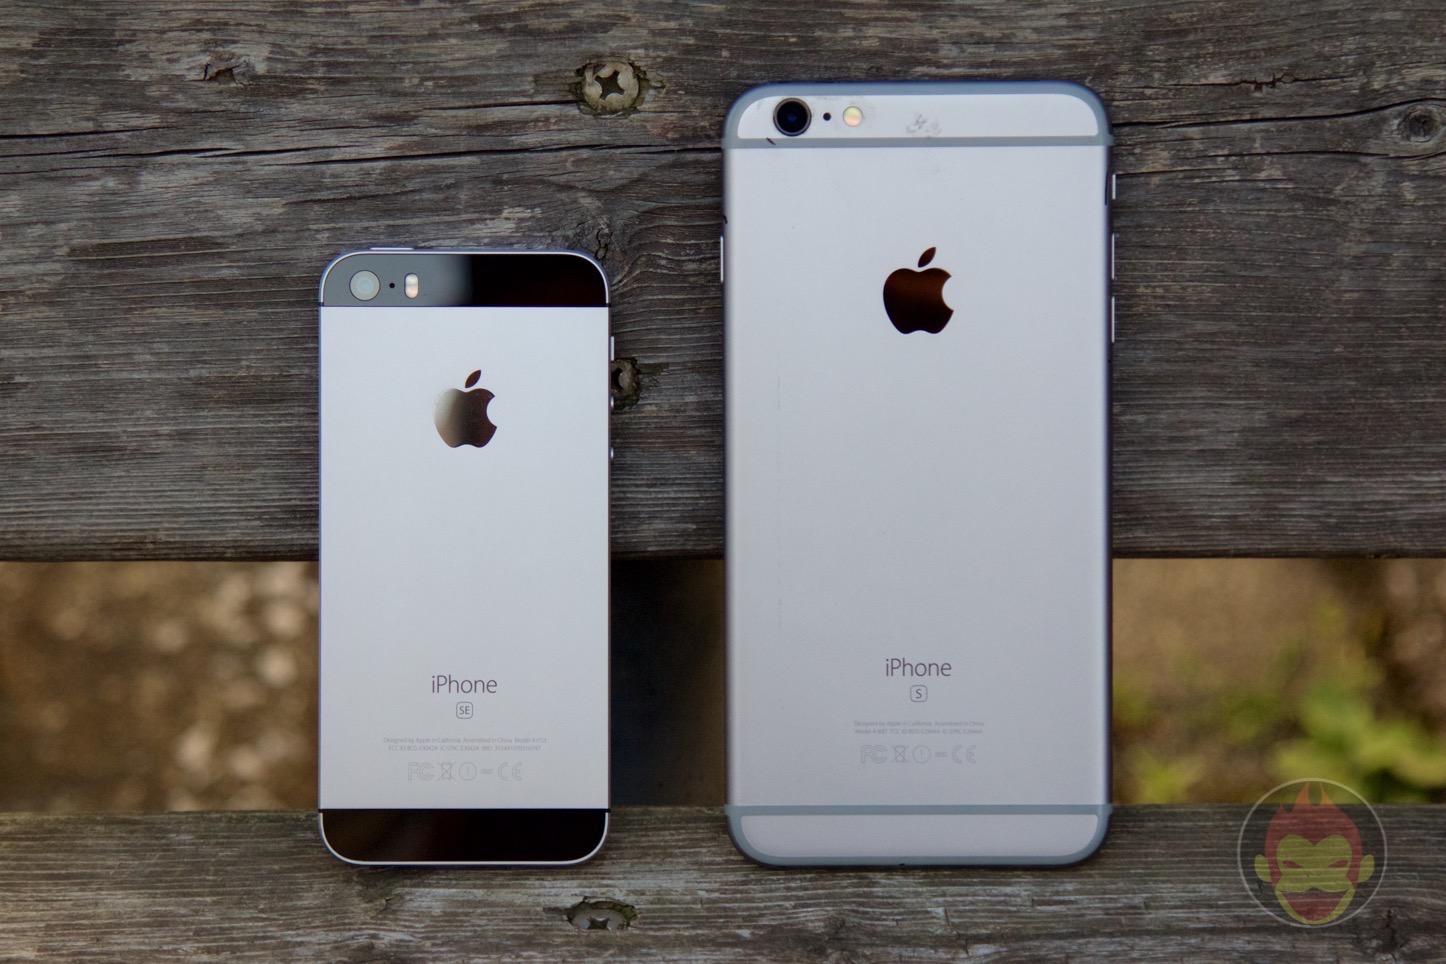 iPhone-SE-Outdoors-photos-10.jpg